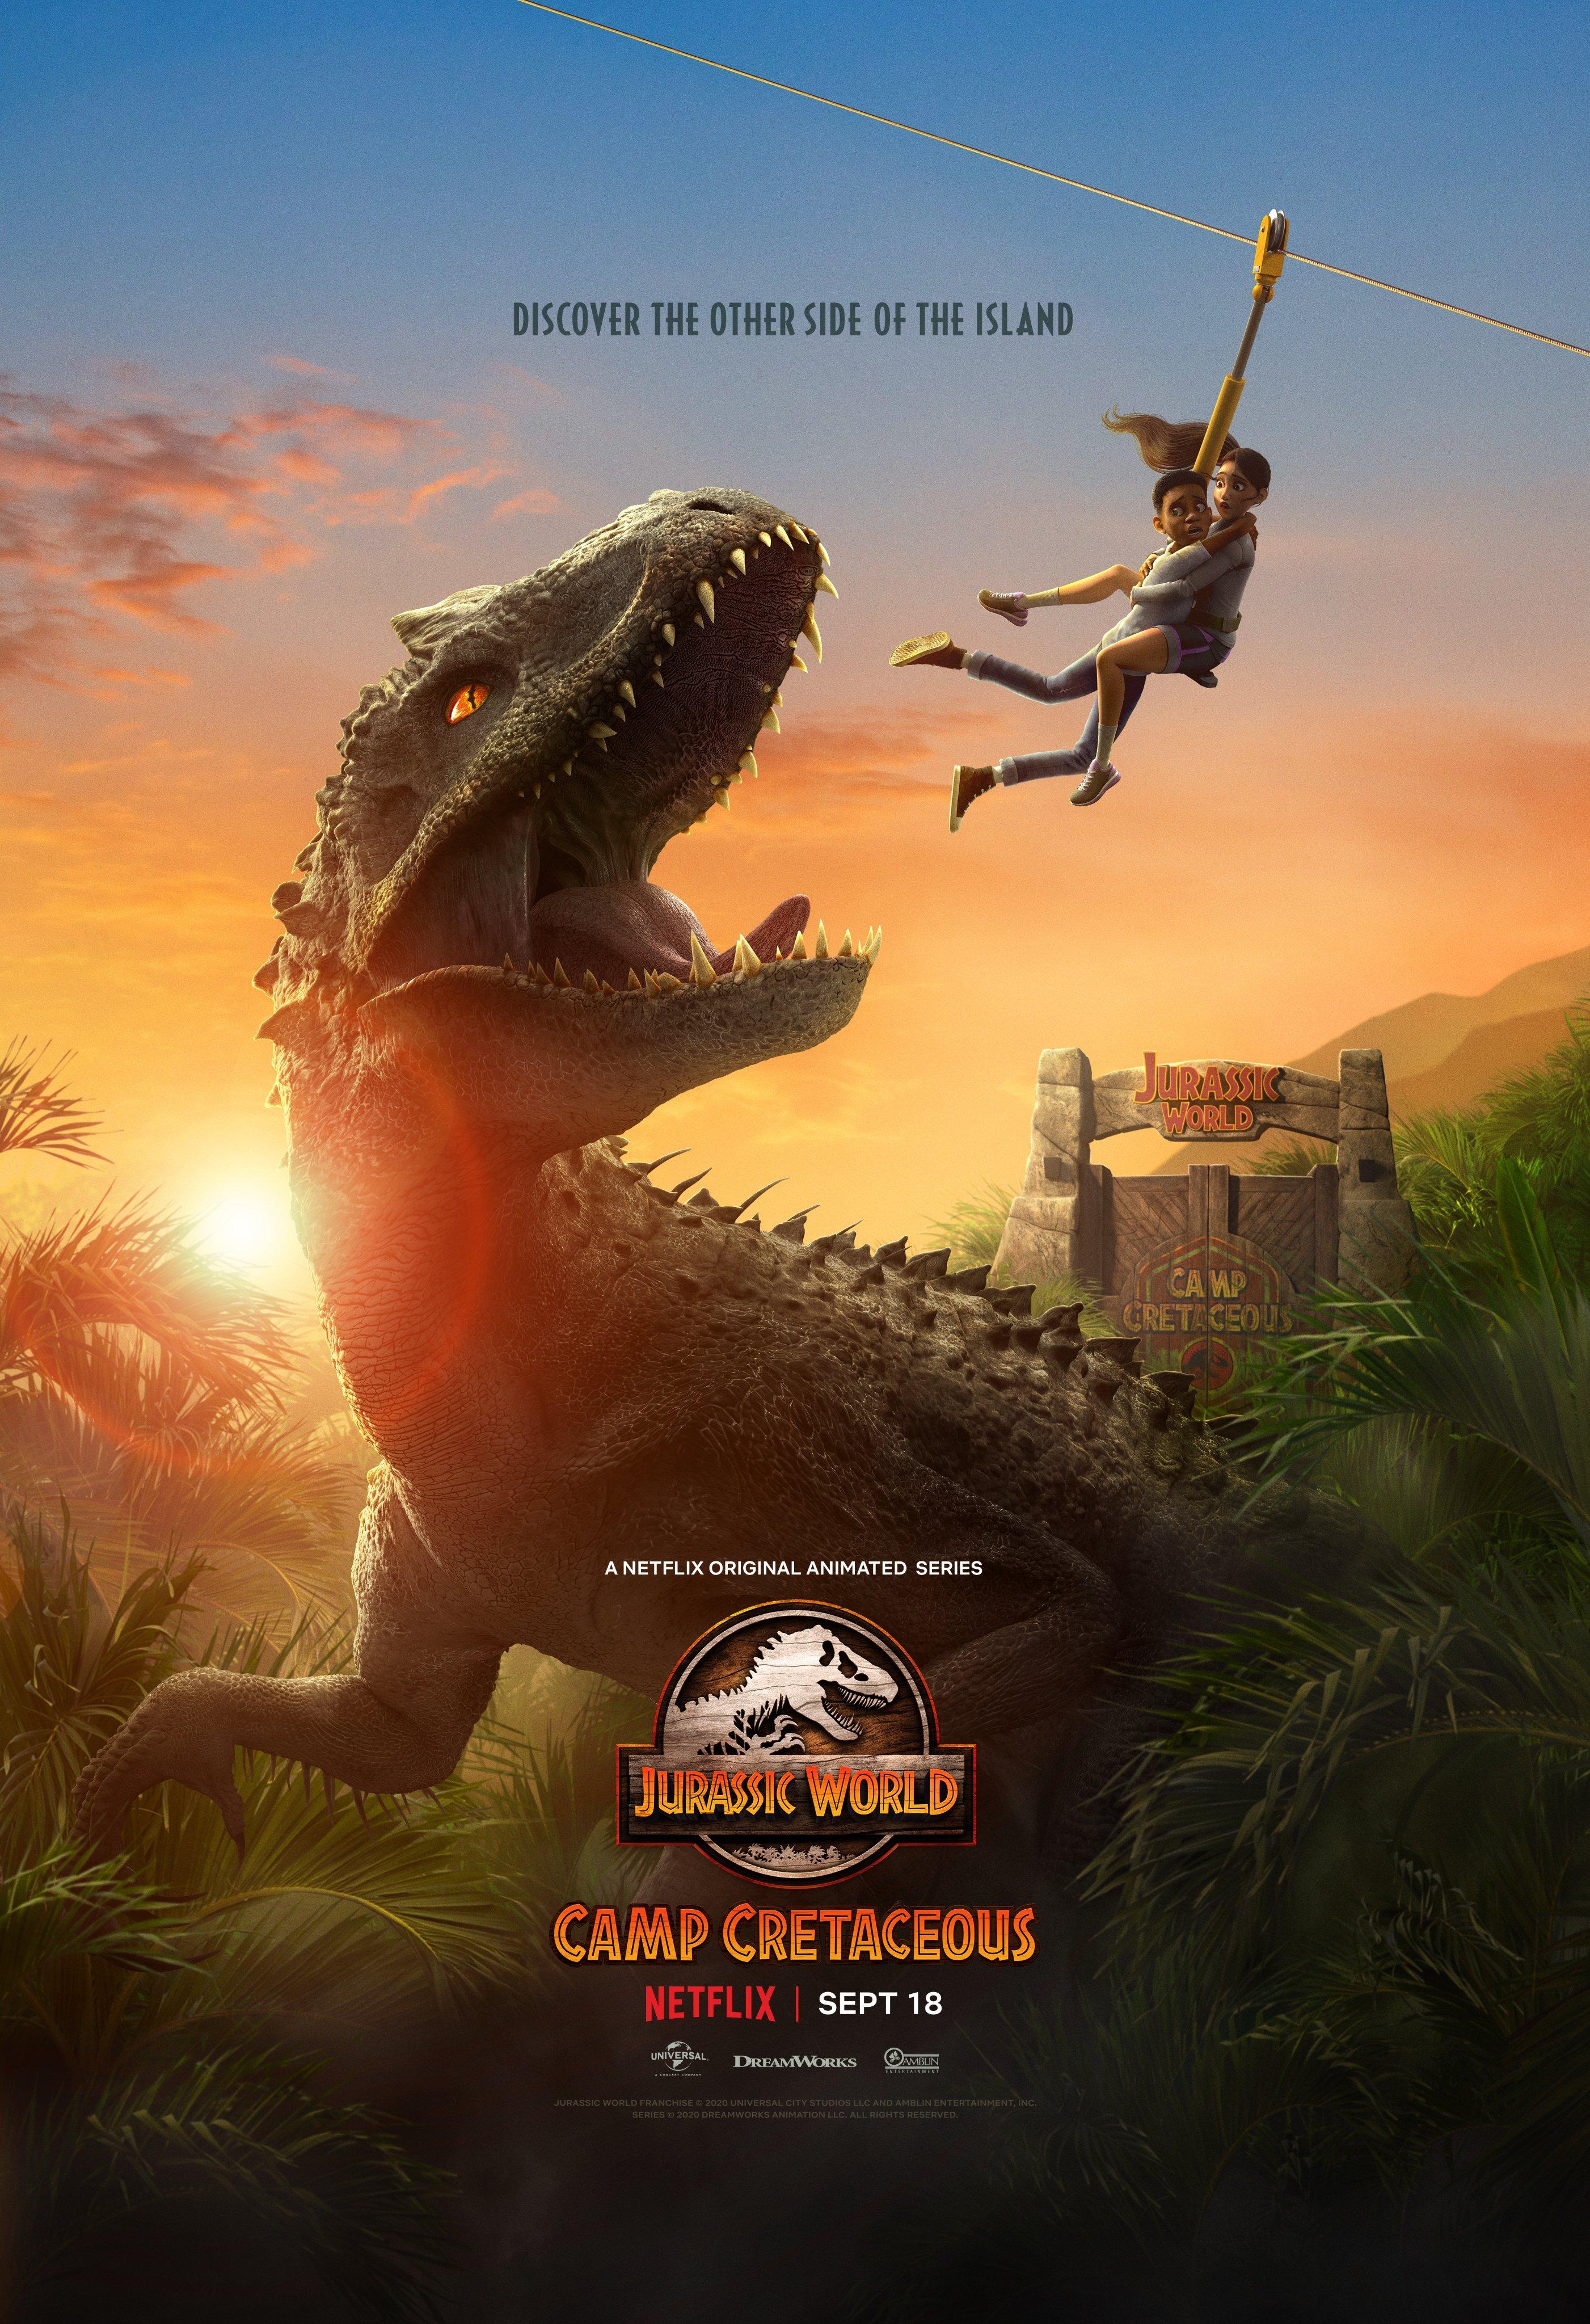 Jurassic World Camp Cretaceous Season 2 จูราสสิค เวิลด์ ค่ายครีเทเชียส ปี2 พากย์ไทย